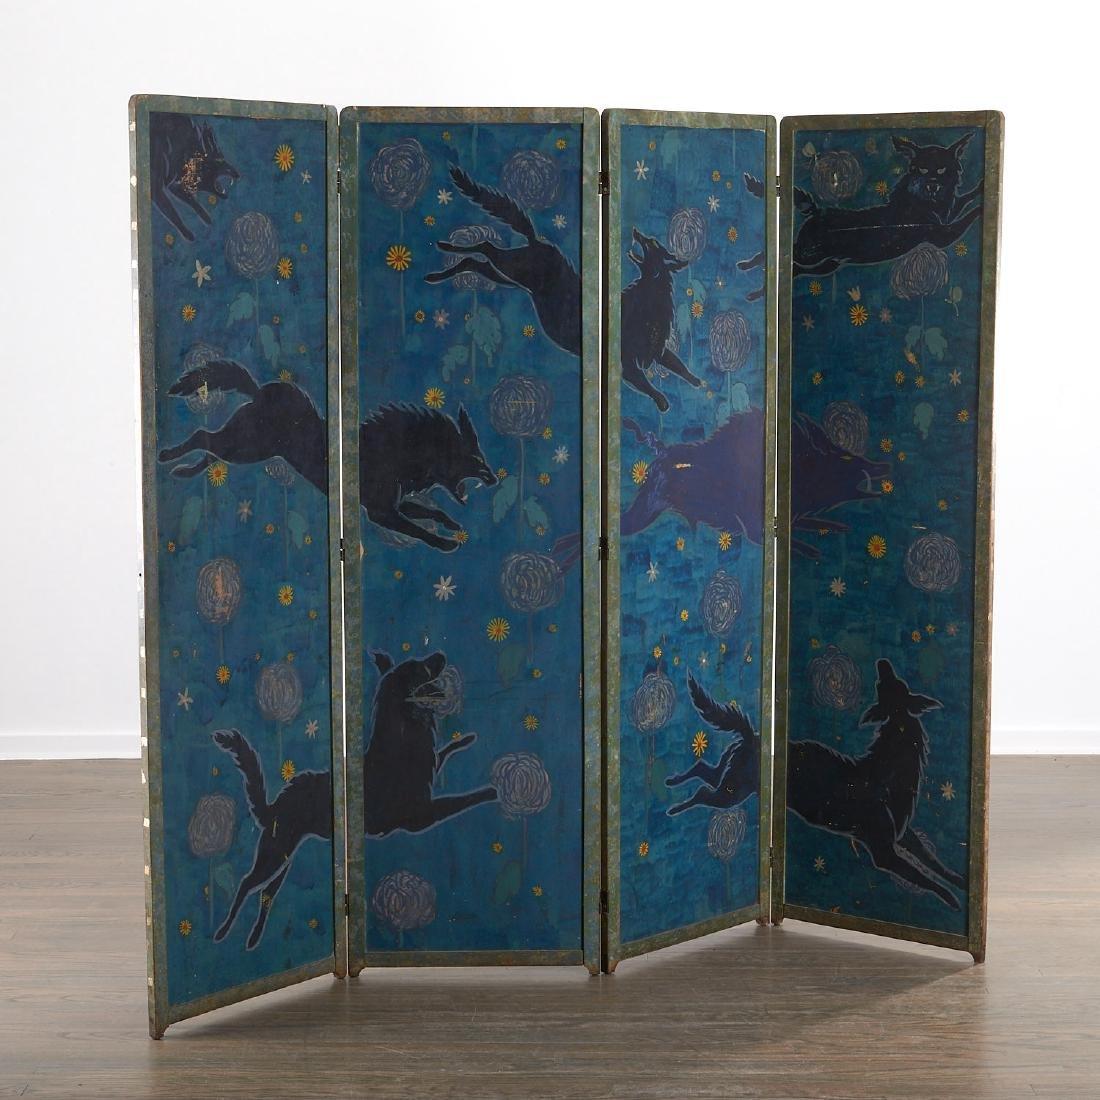 Anne Hyatt Huntington, painted screen